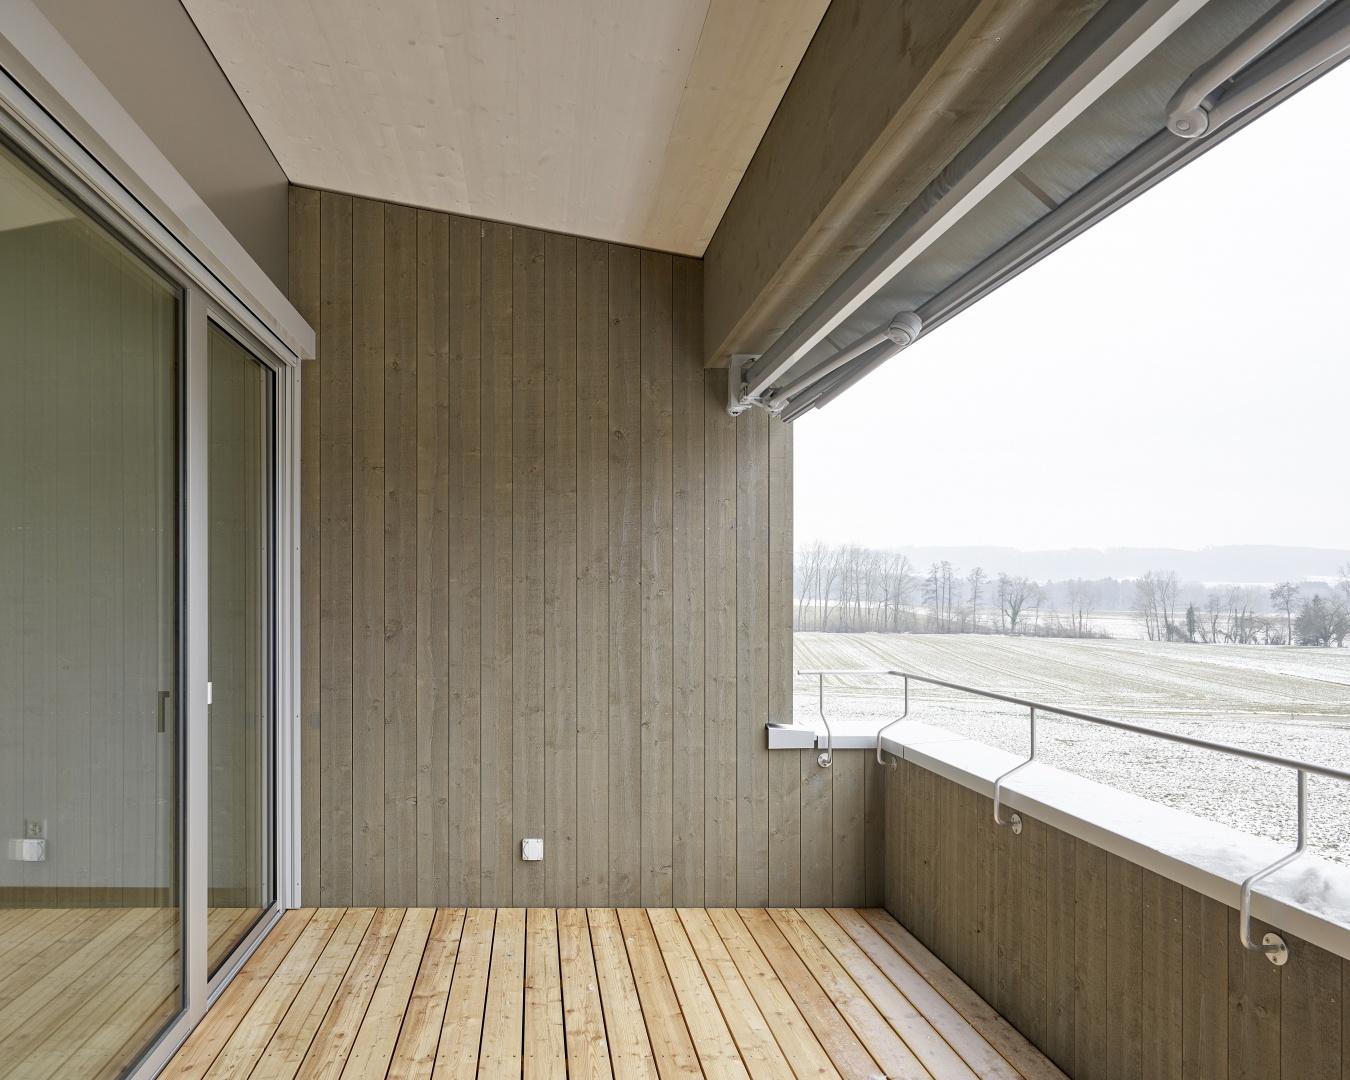 Wohnung OG02 Loggia © Antoniol + Huber + Partner, Zürcherstrasse 125, 8500 Frauenfeld